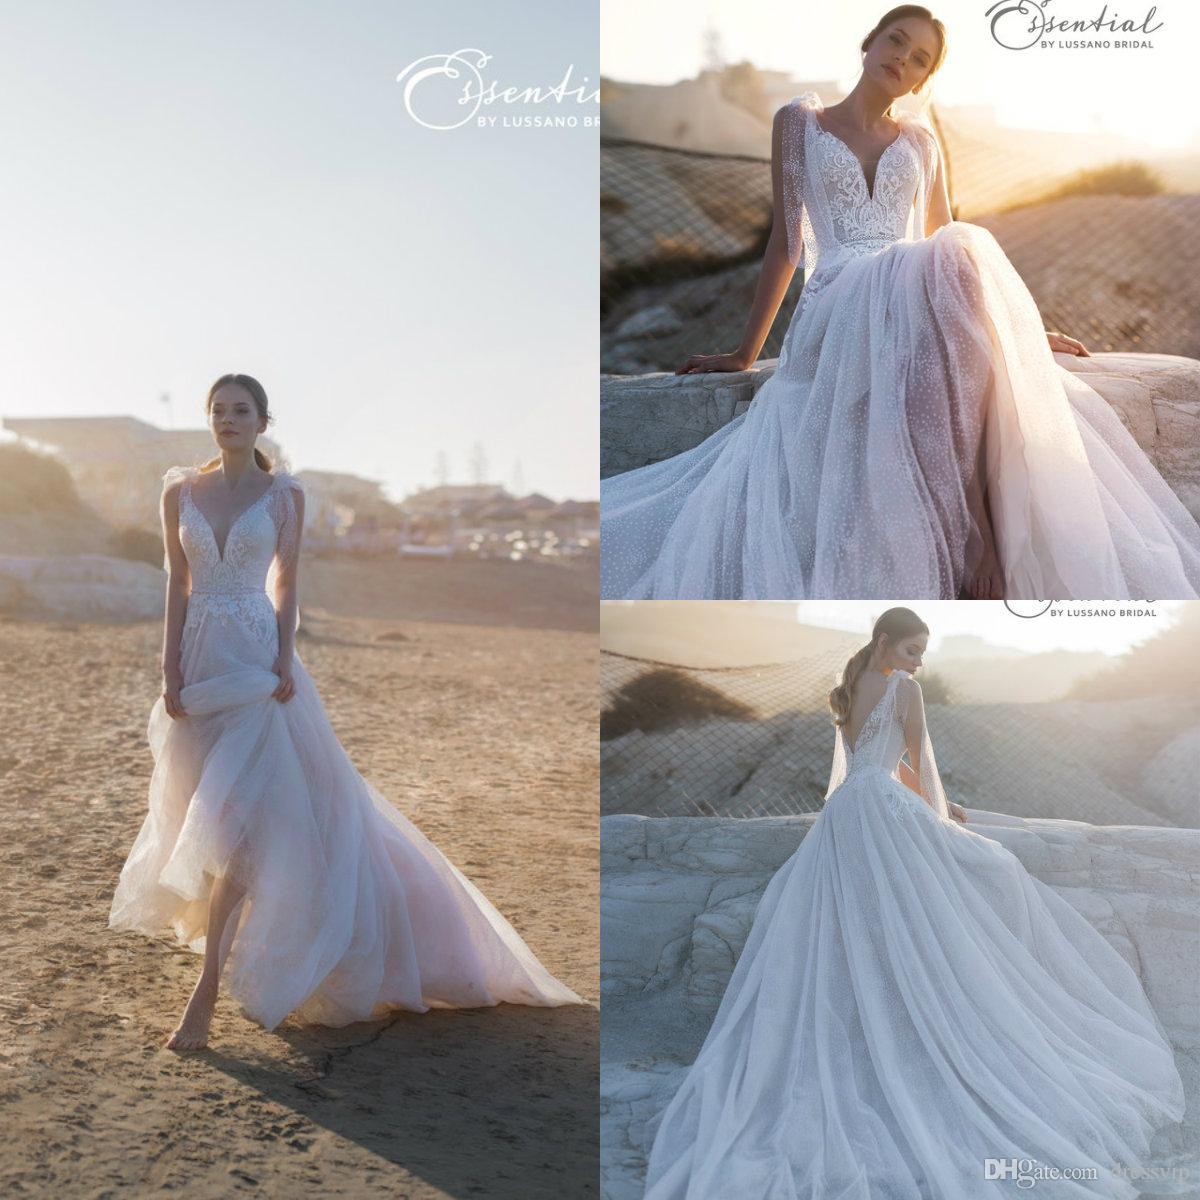 2019 A Line Bohemian Wedding Dresses Spaghetti Sexy Backless Sweep Train Belt Beach Boho Bridal Gowns Wedding Dress Custom Made Plus Size